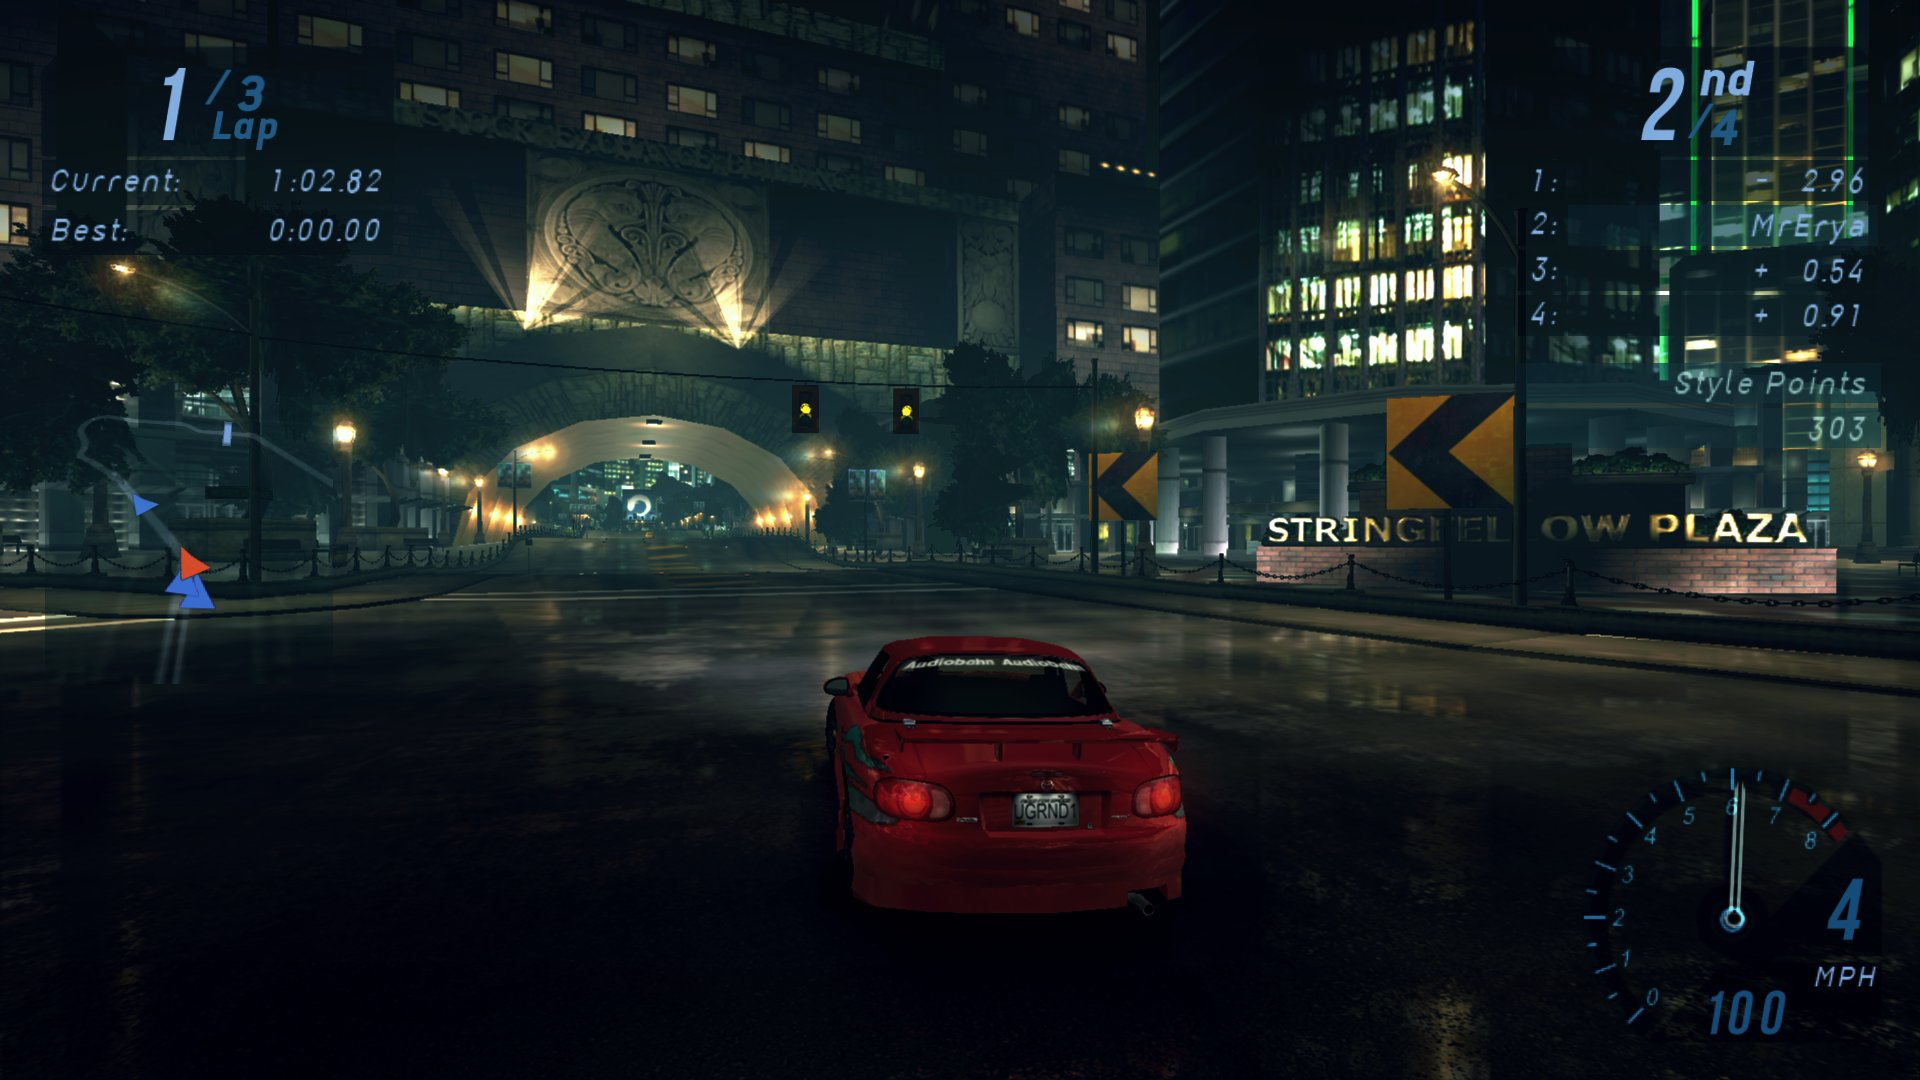 NFS: Underground: Redux Mod для Другие игры - Скриншот 2